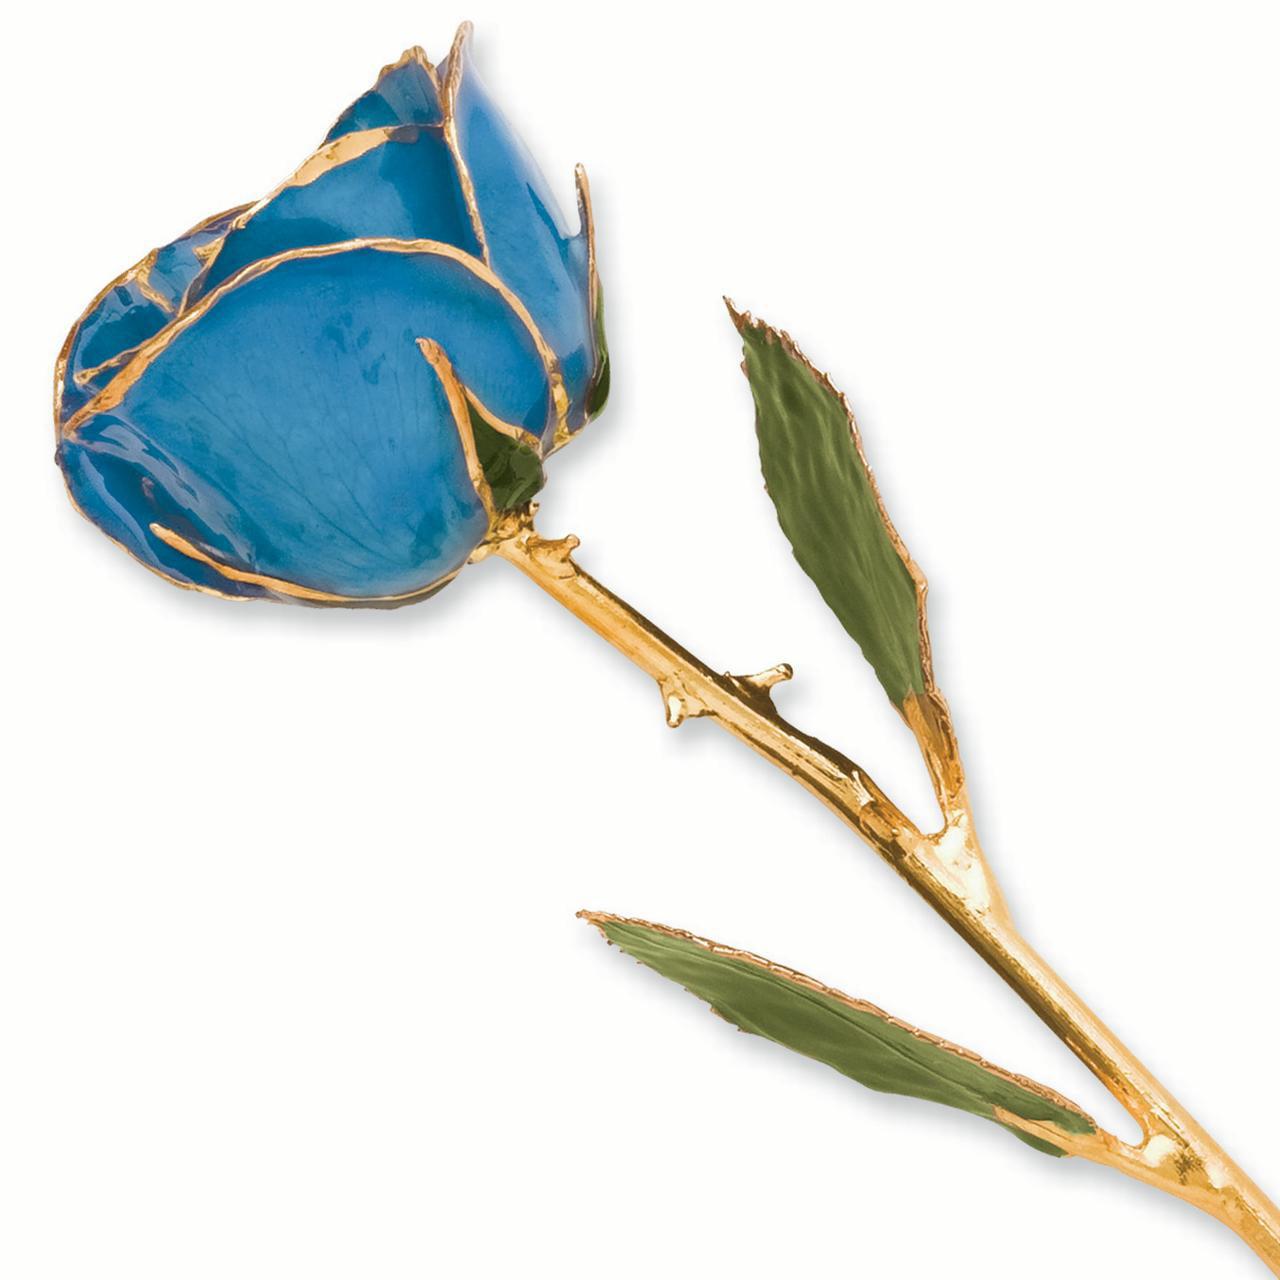 Lacquer Dipped Gold Trim Blue Rose Figurine Orchid Leaf K Trimmed Keepsake Floral Home Decor Flower For Women